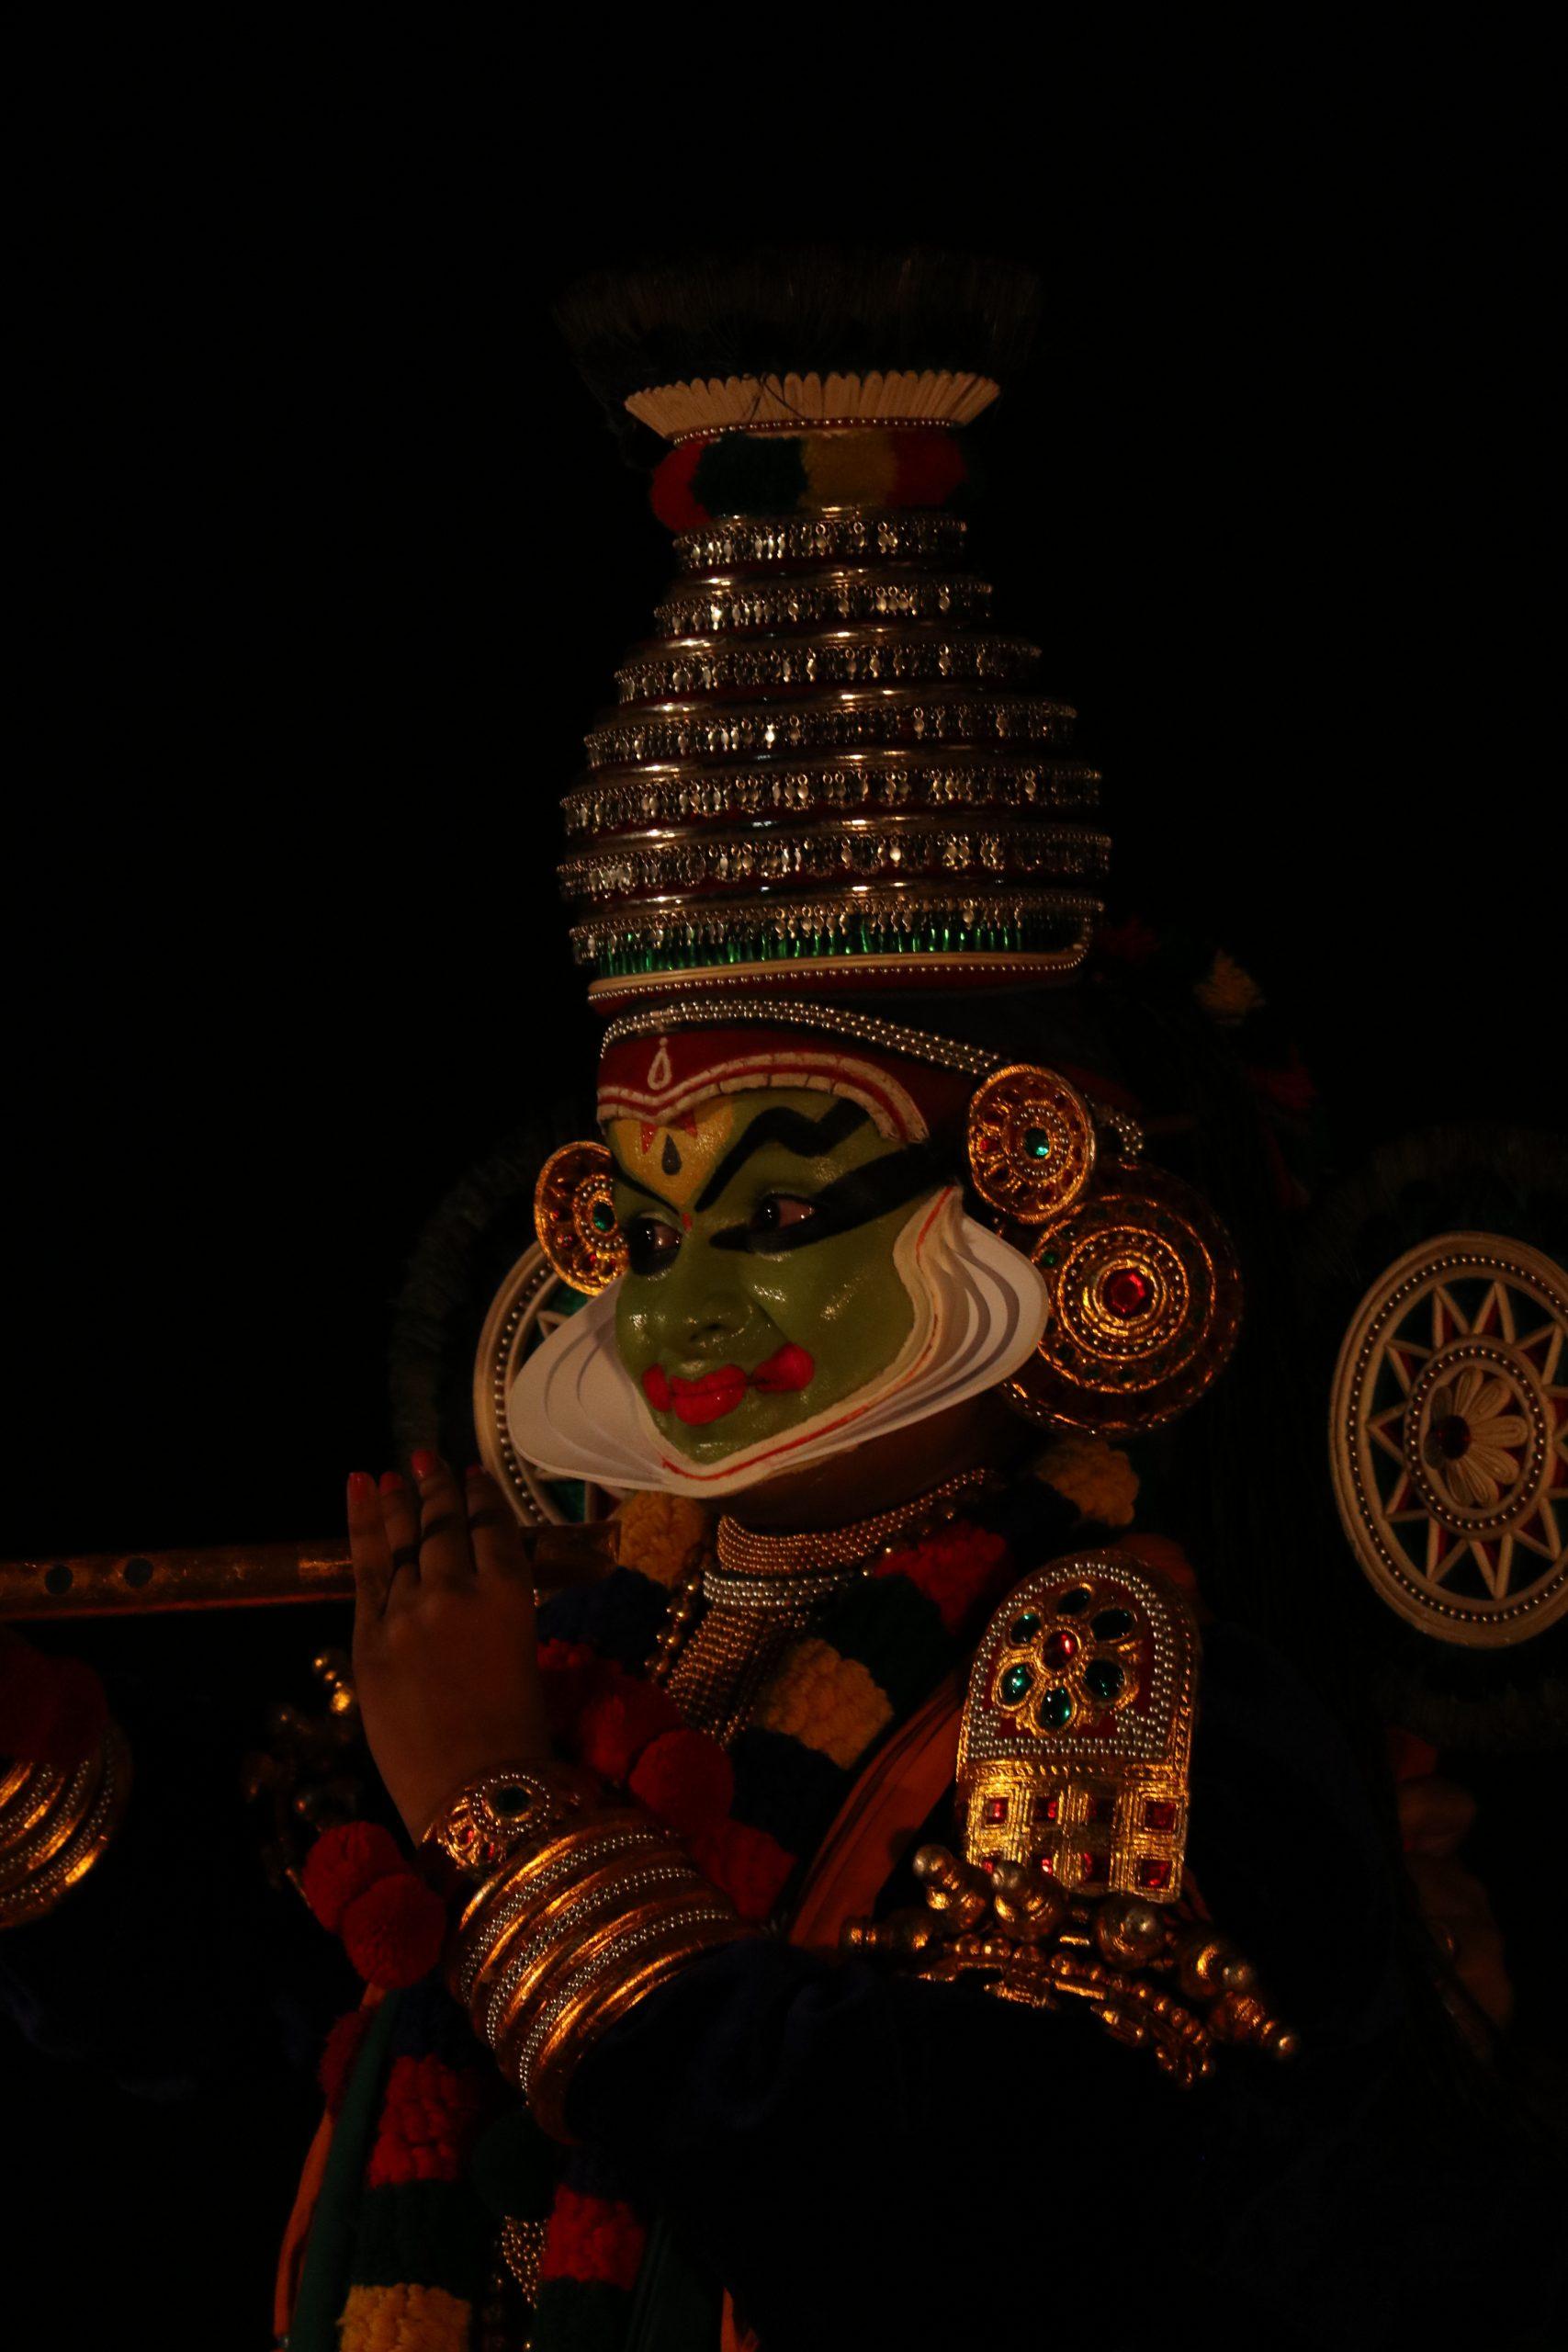 Portrait of a Kathakali dancer